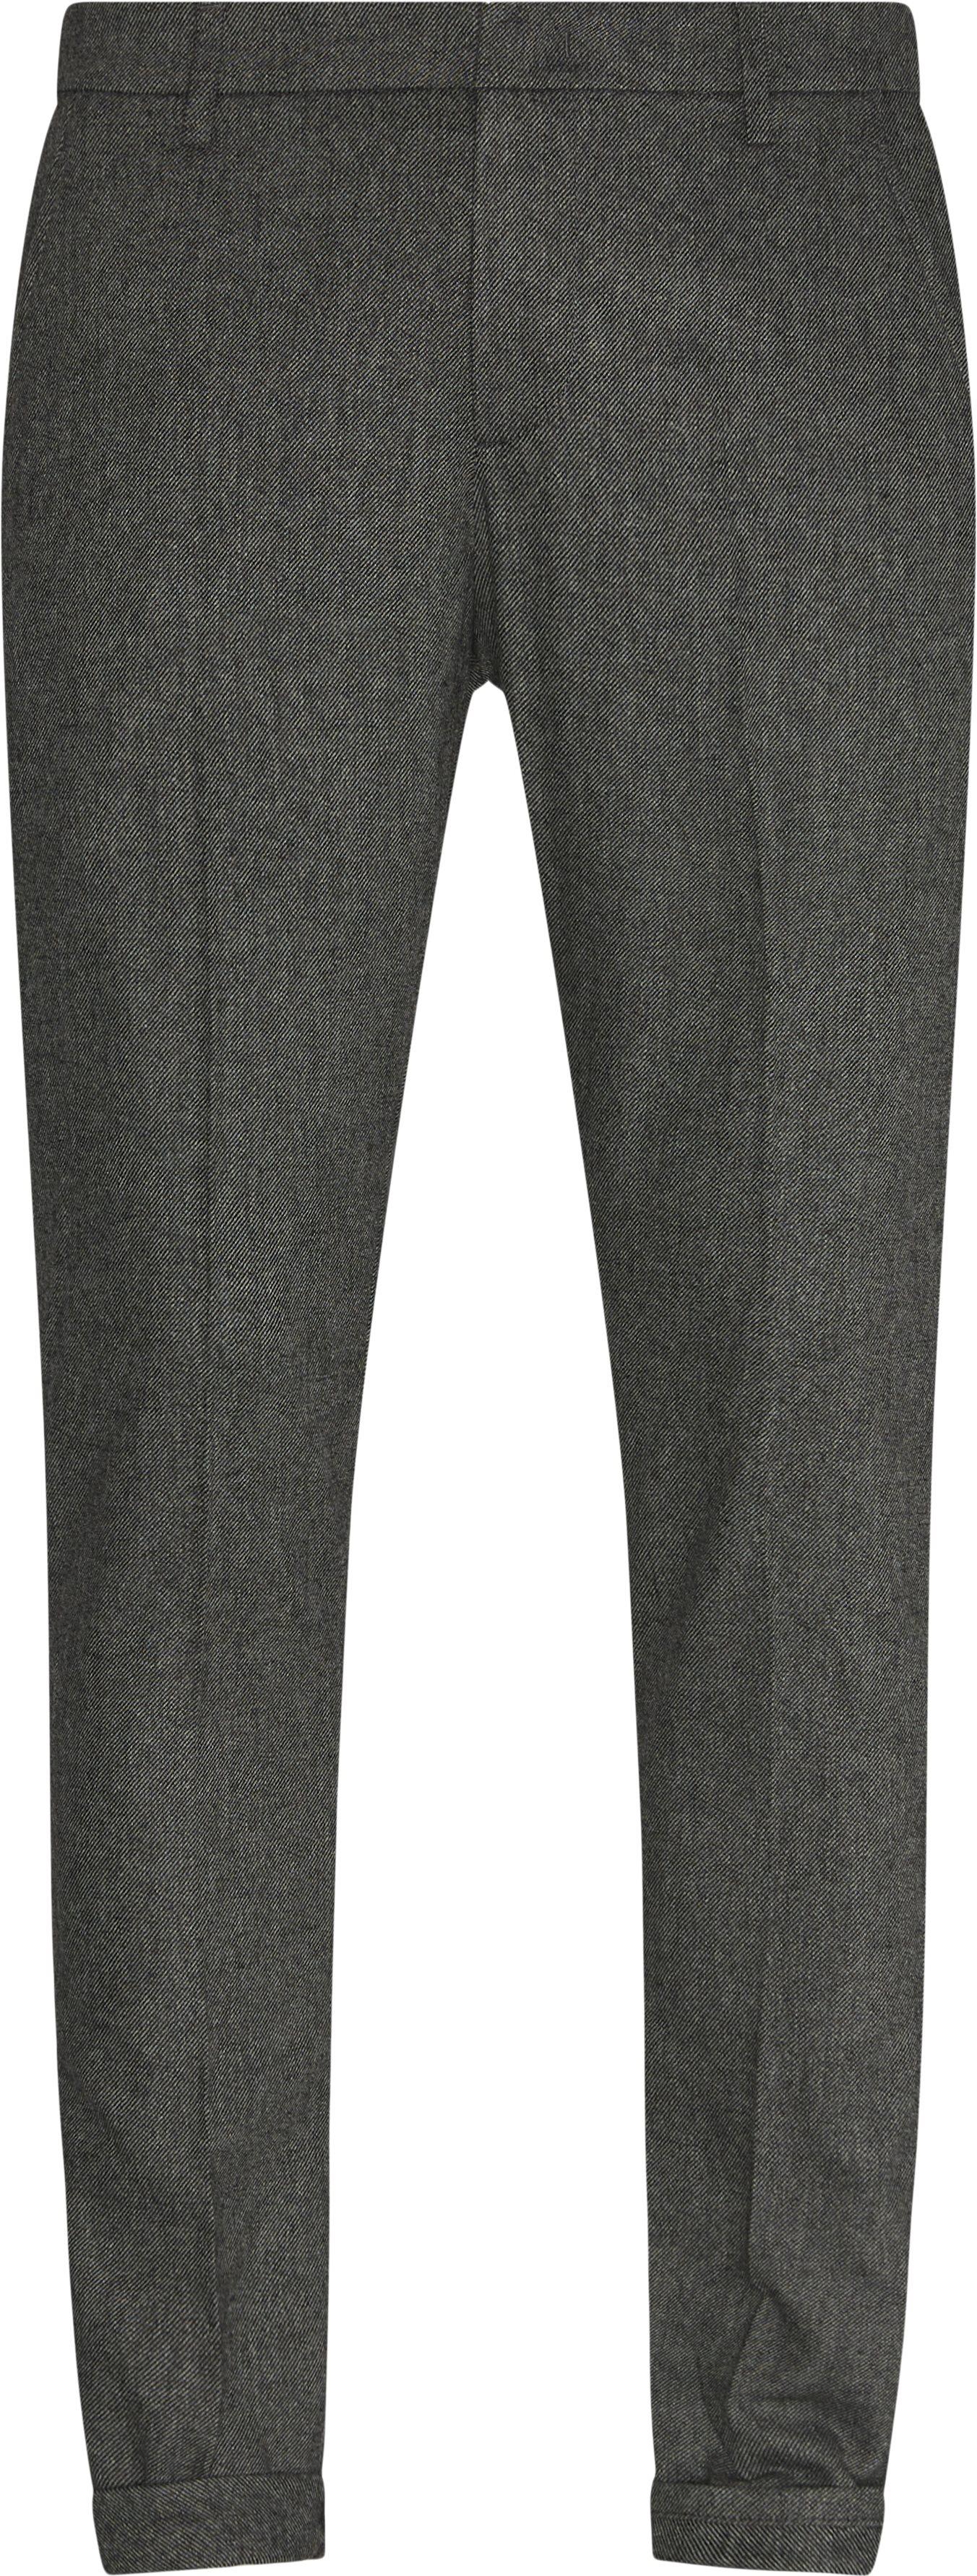 Comfort Pants - Bukser - Slim fit - Grå